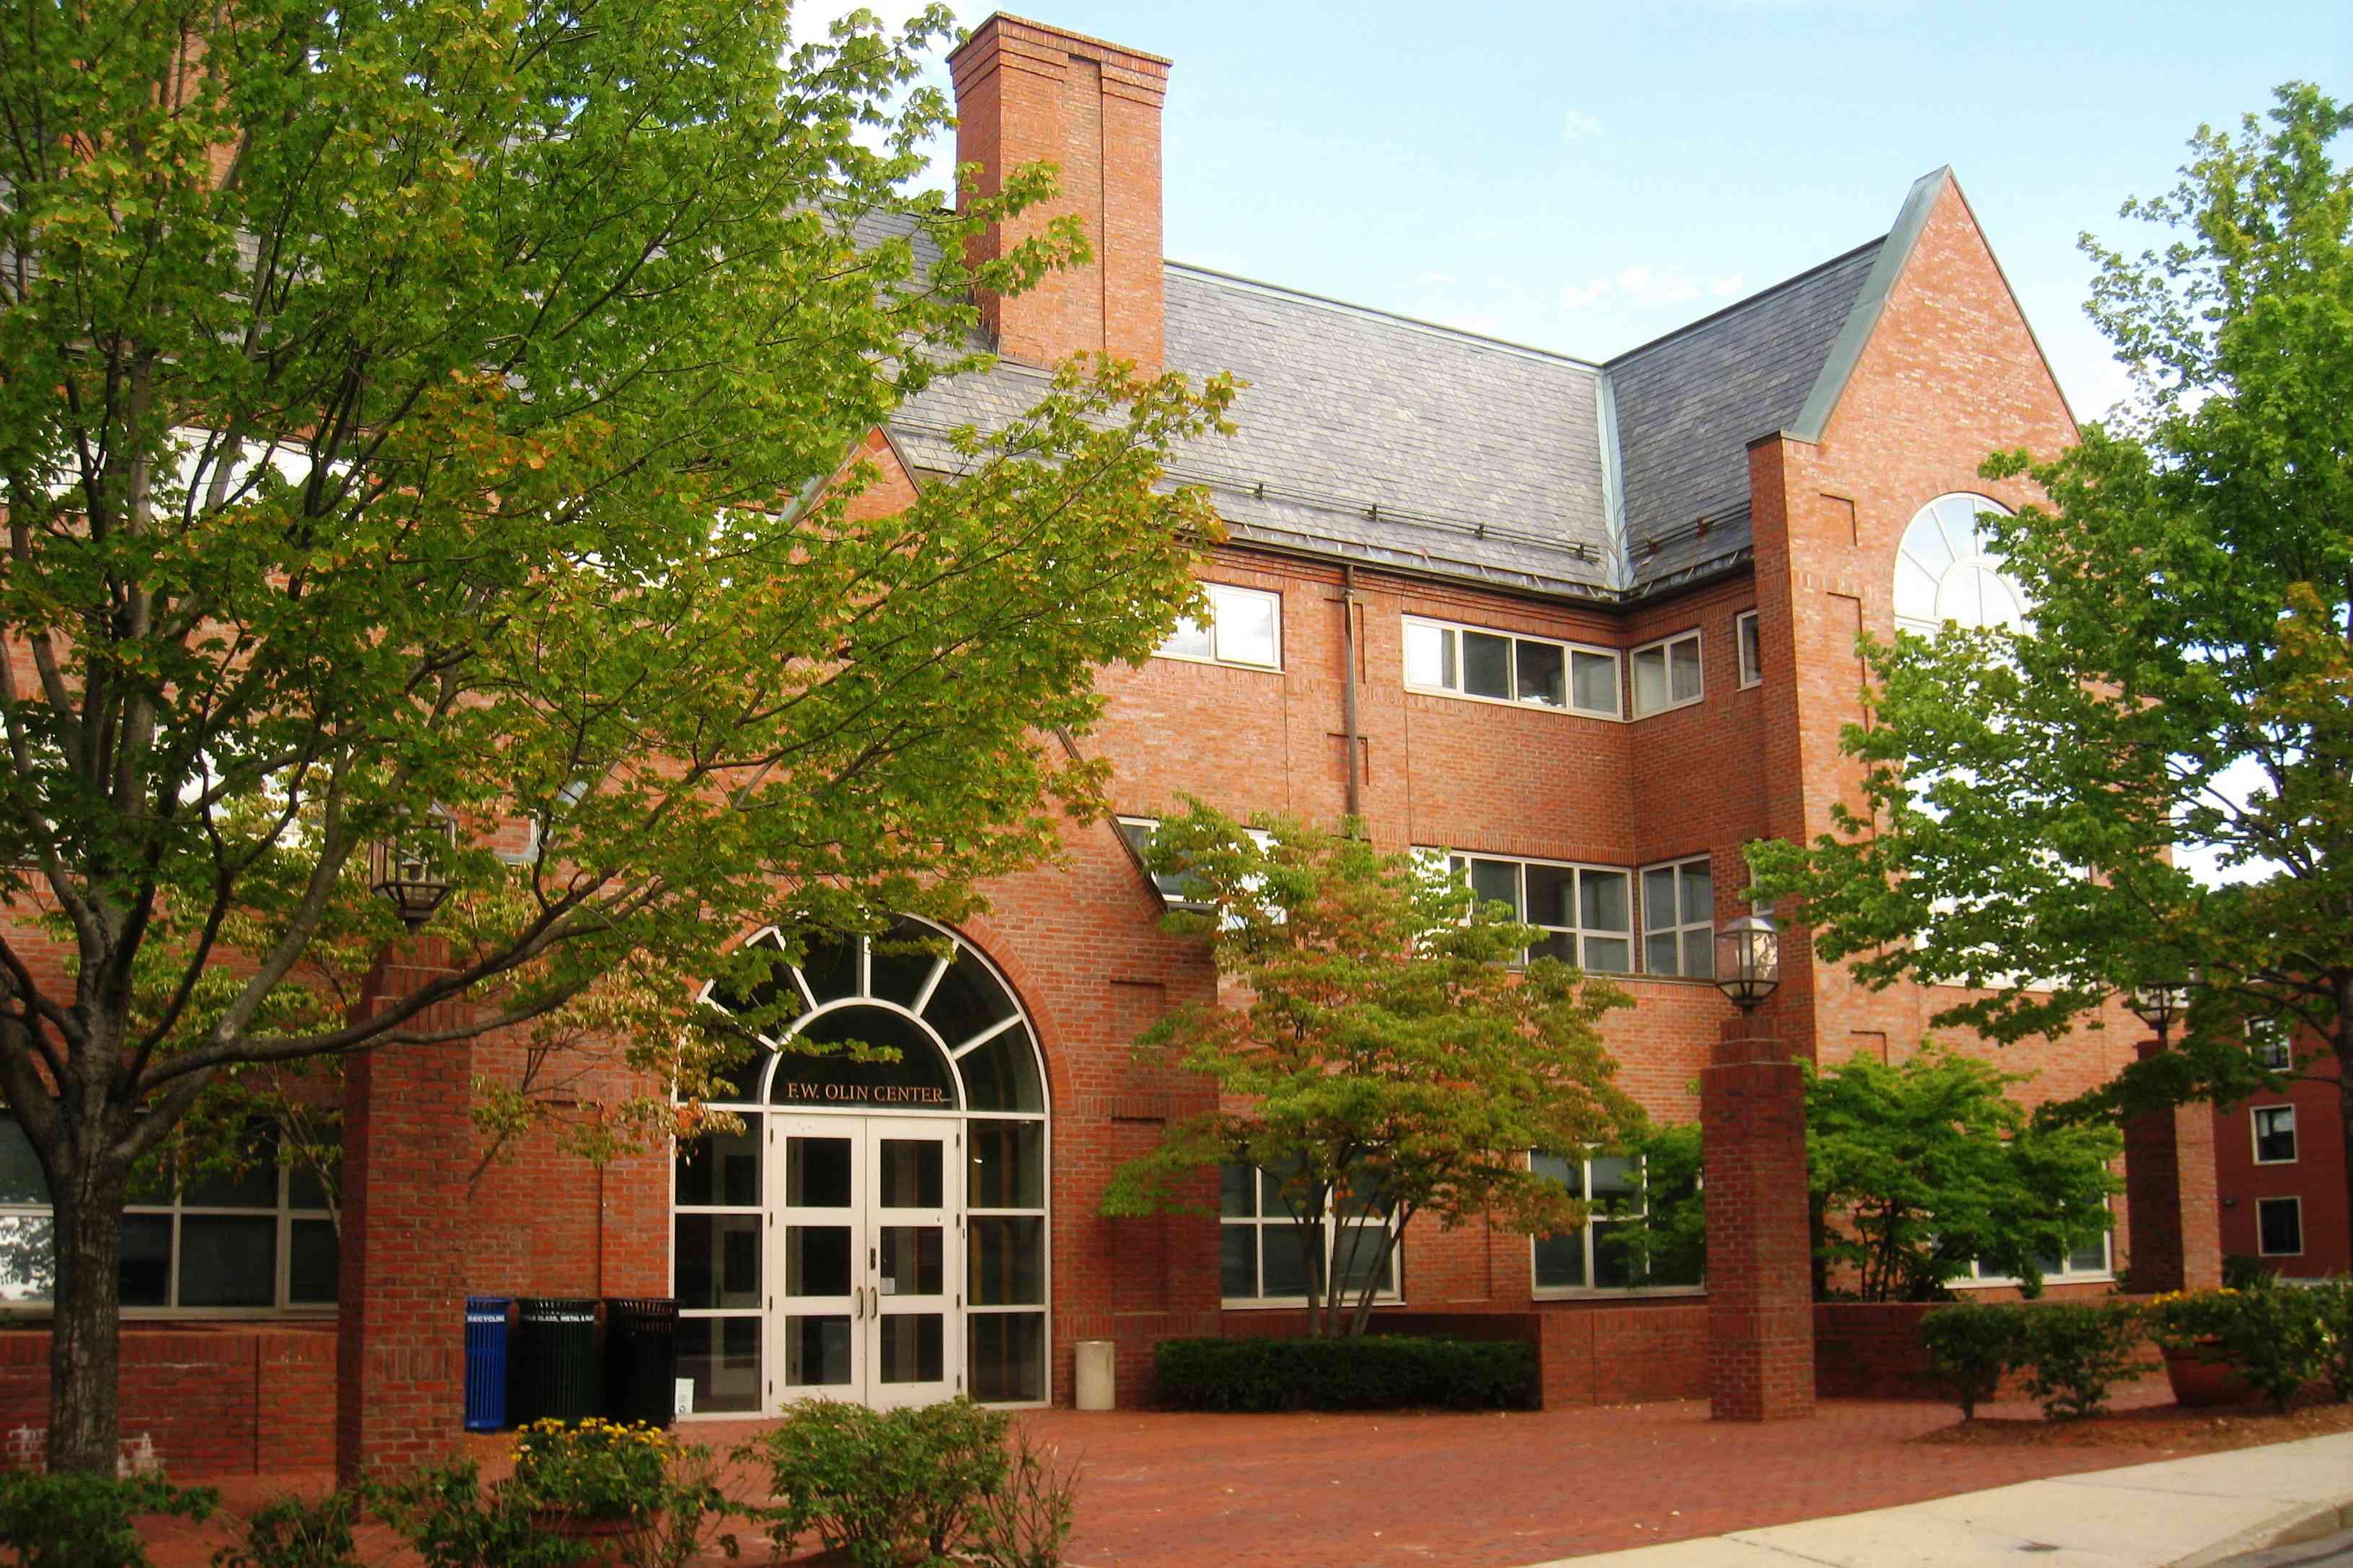 Tufts University Olin Center